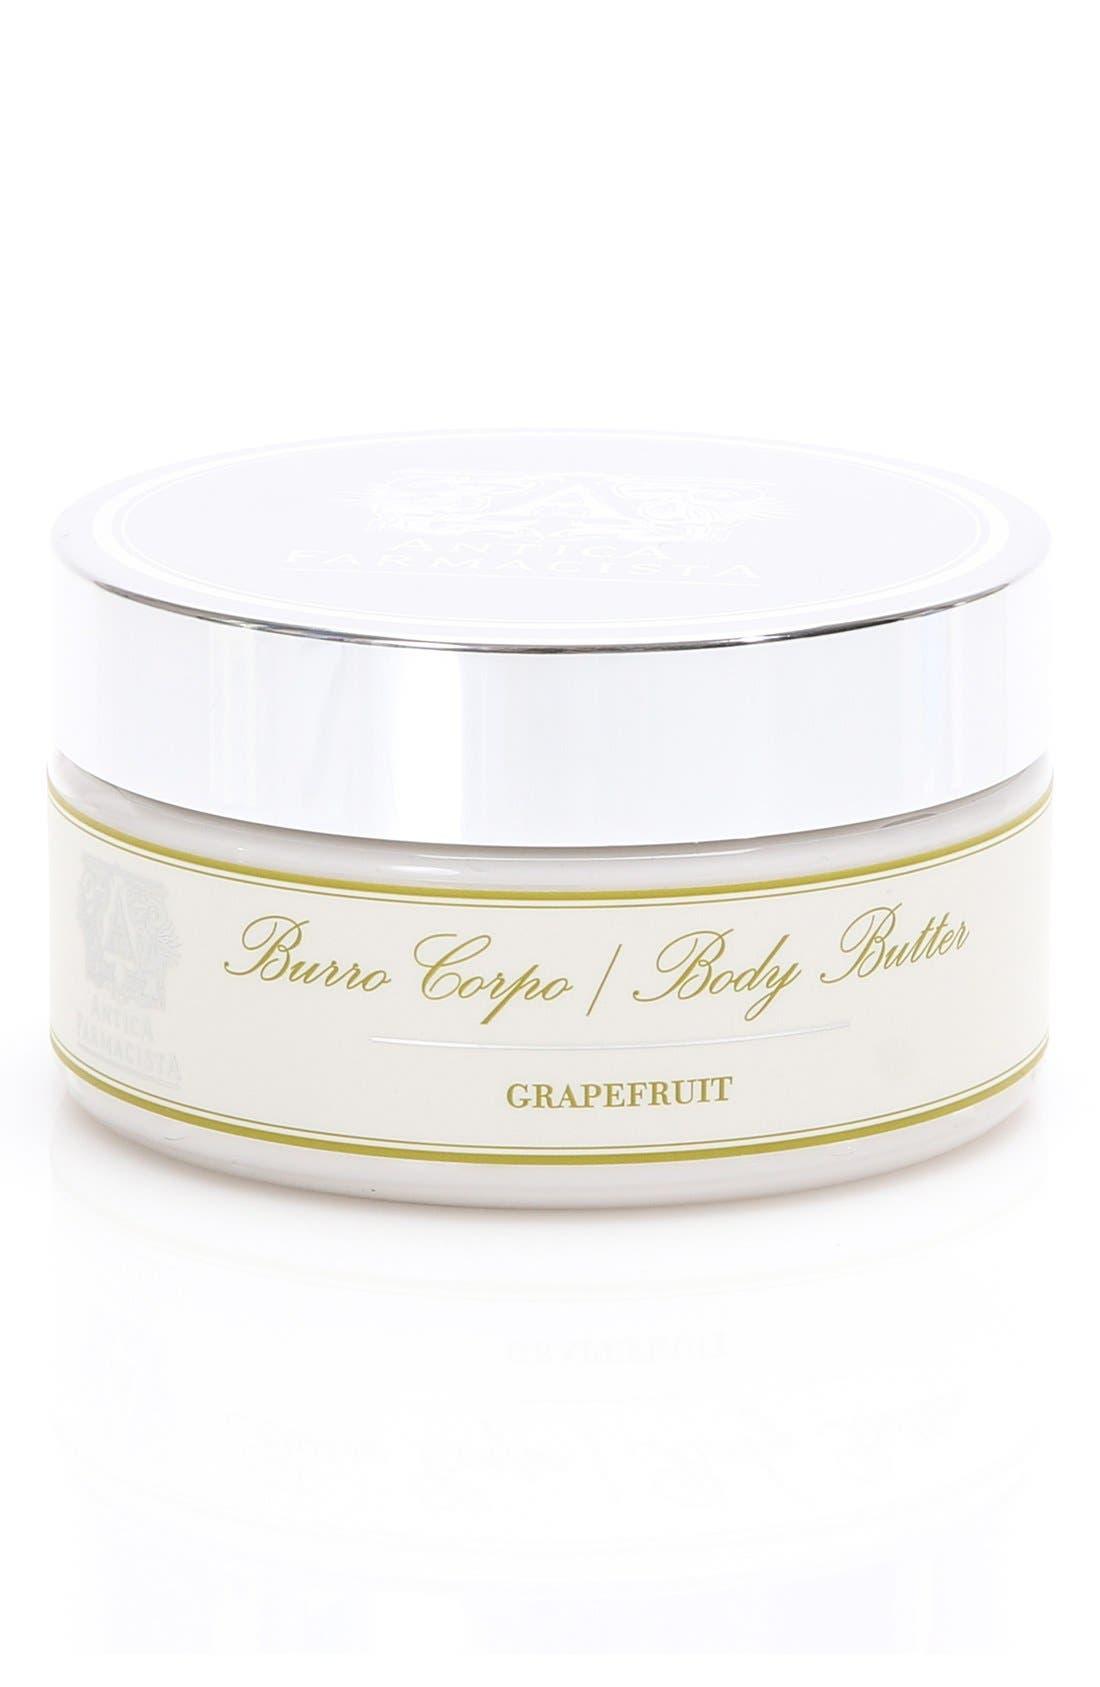 Antica Farmacista 'Grapefruit' Body Butter